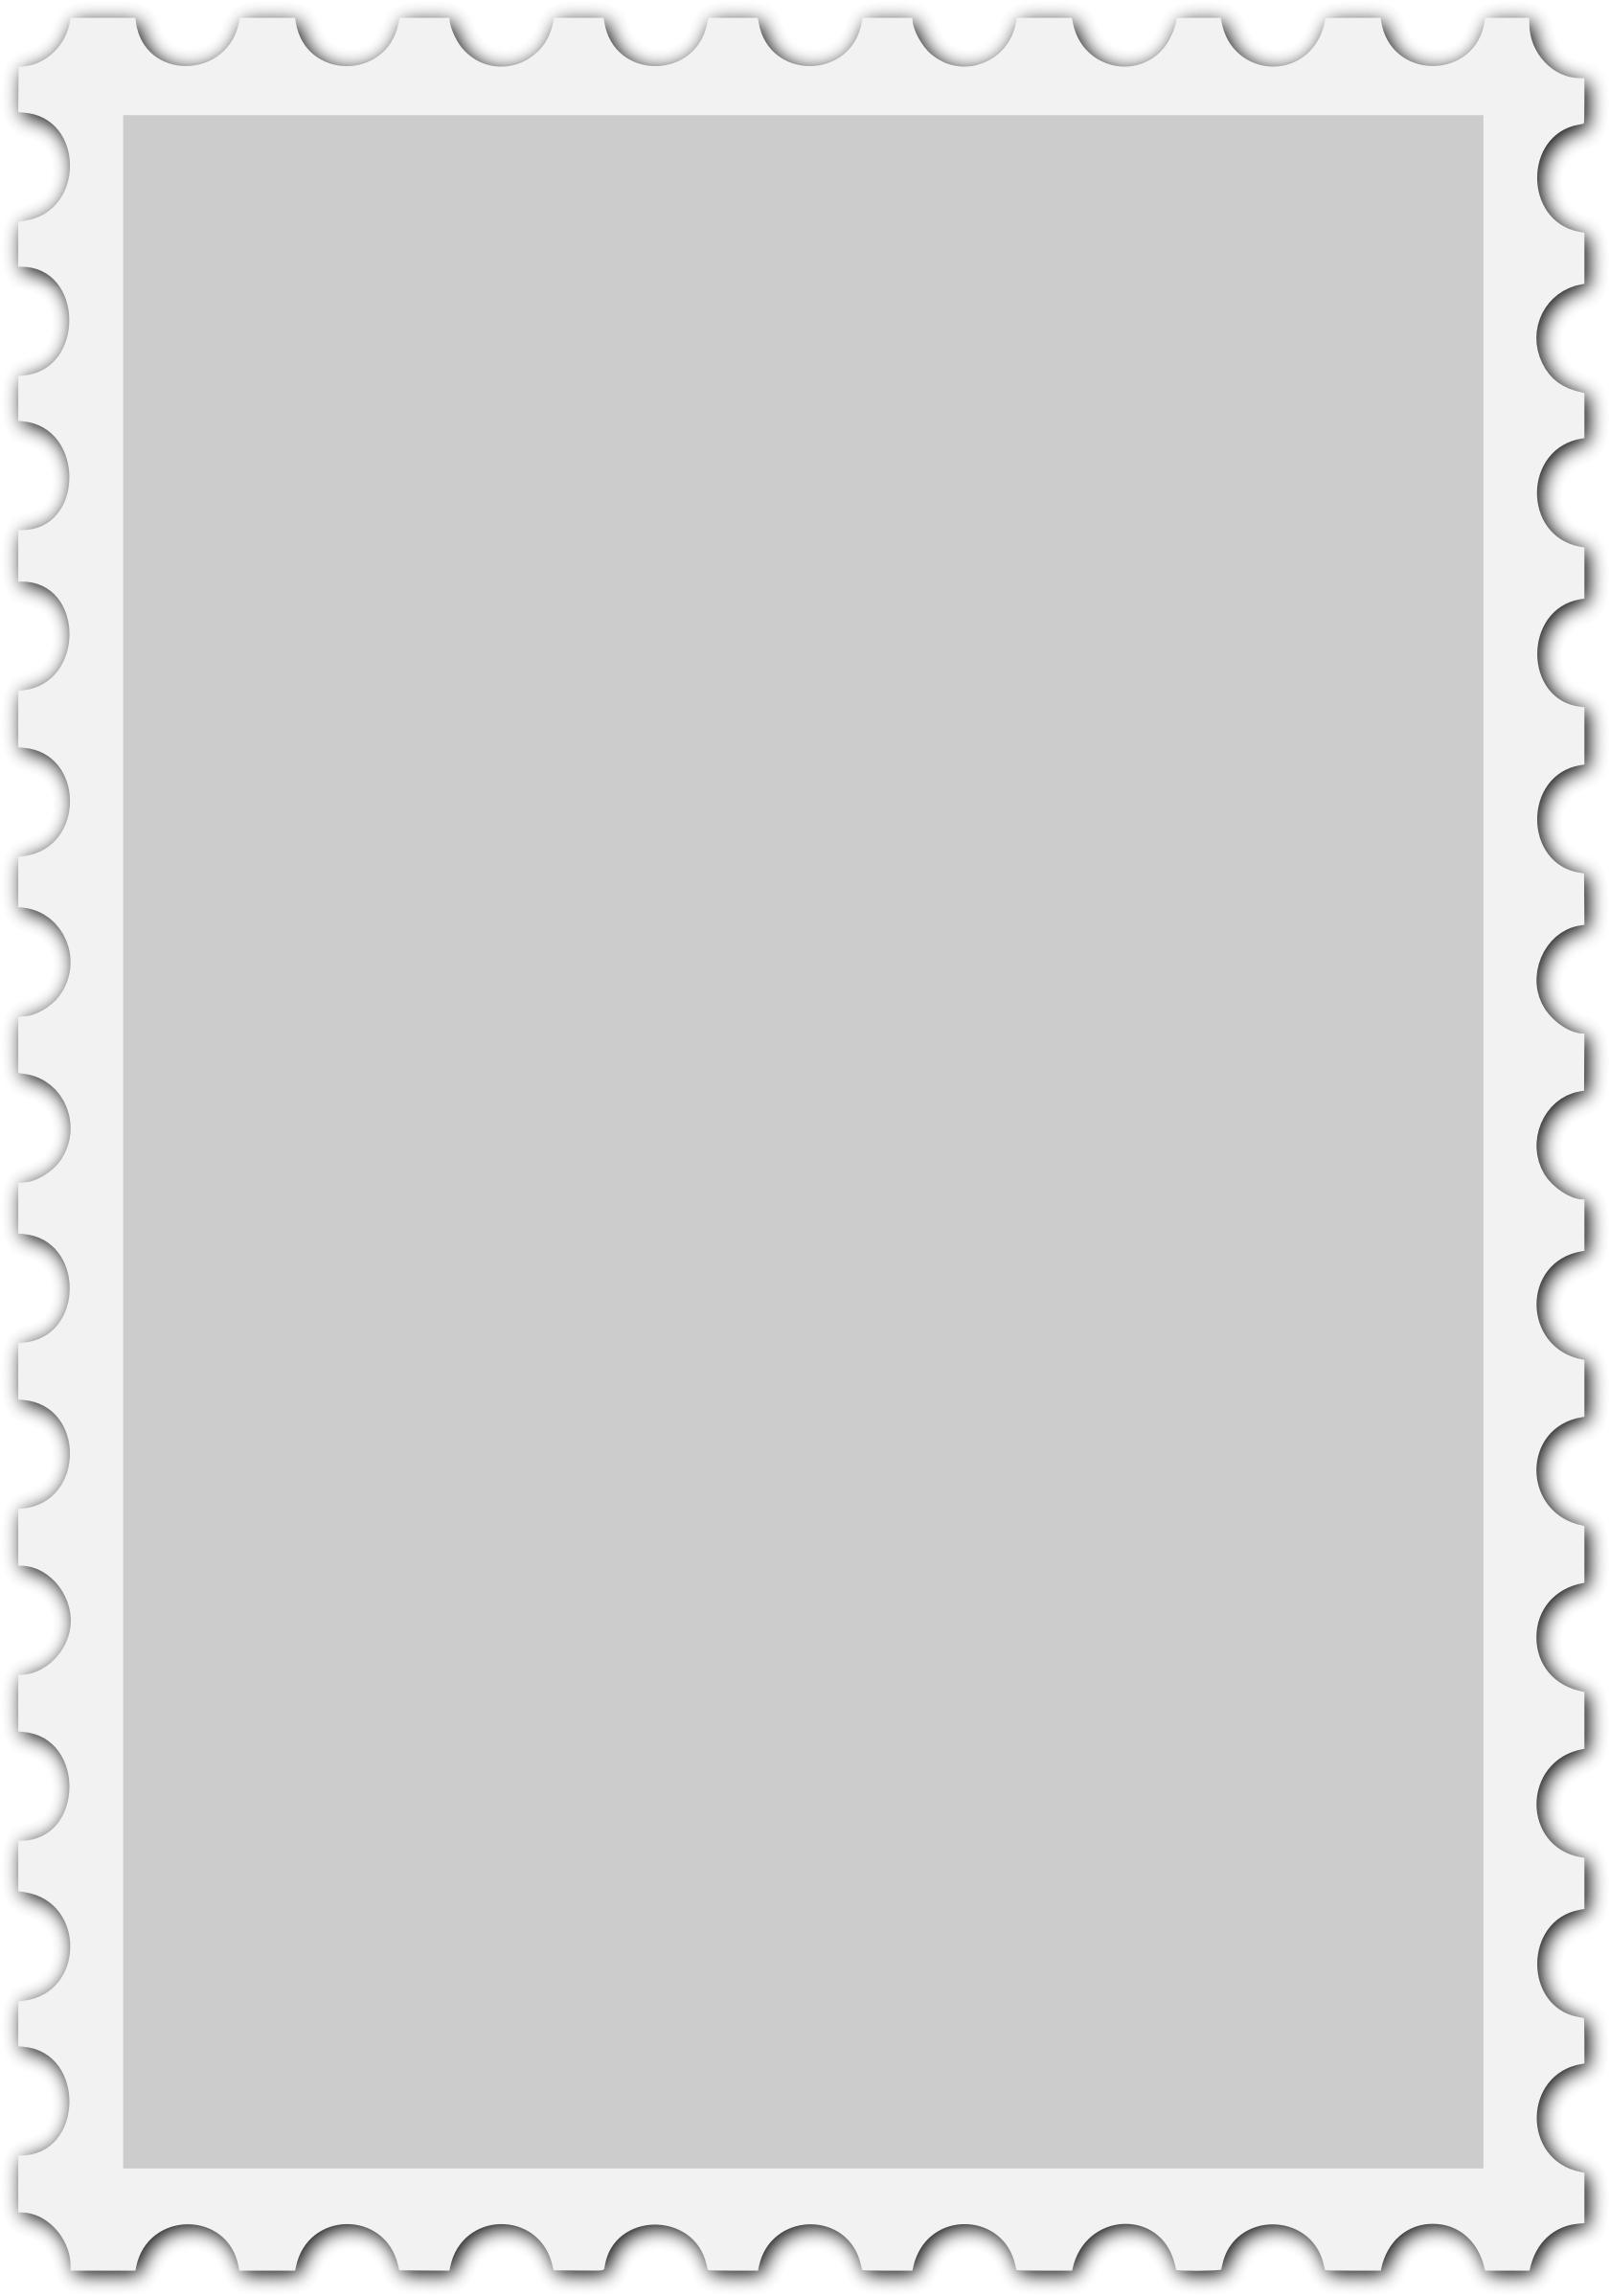 Blank stamp photo